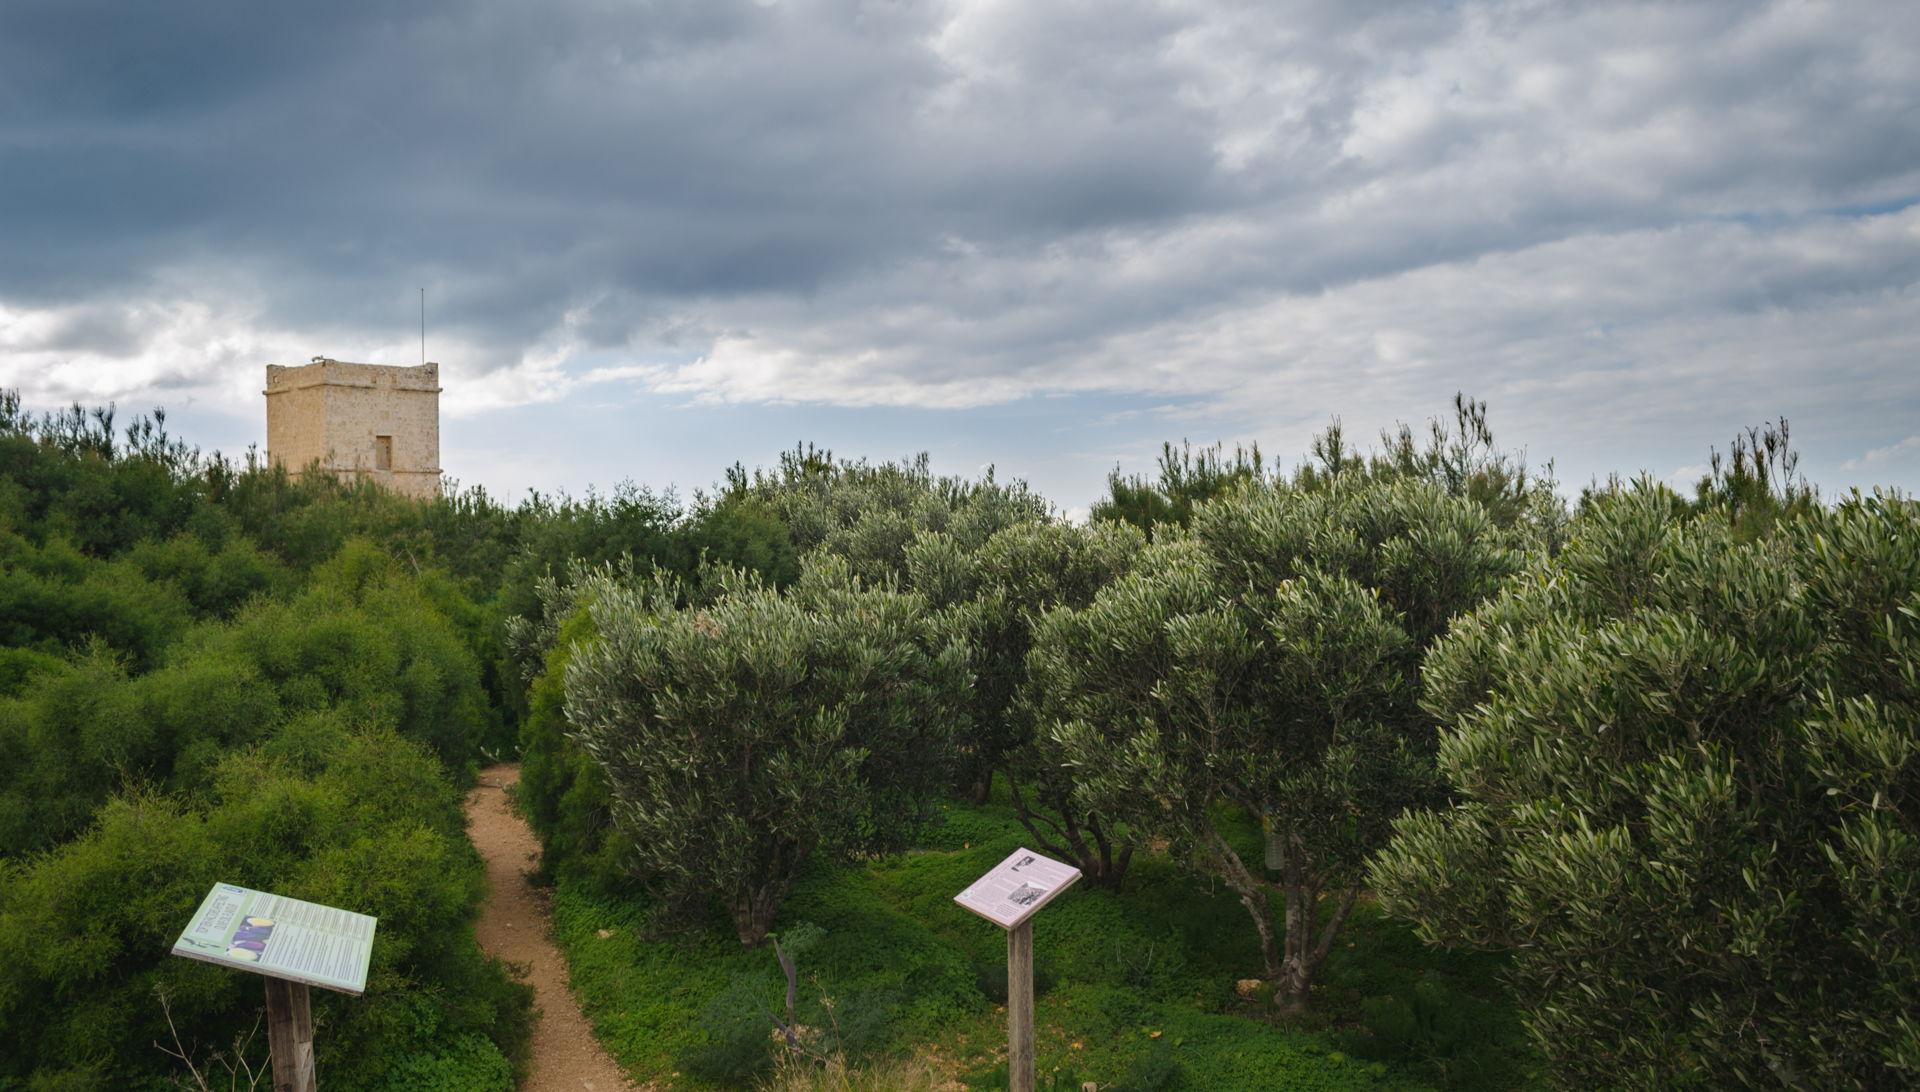 Gaia Peace Grove, olive trees hive malta, olive trees malta, Gaia Peace Grove malta, olive tree medical malta, human rights malta